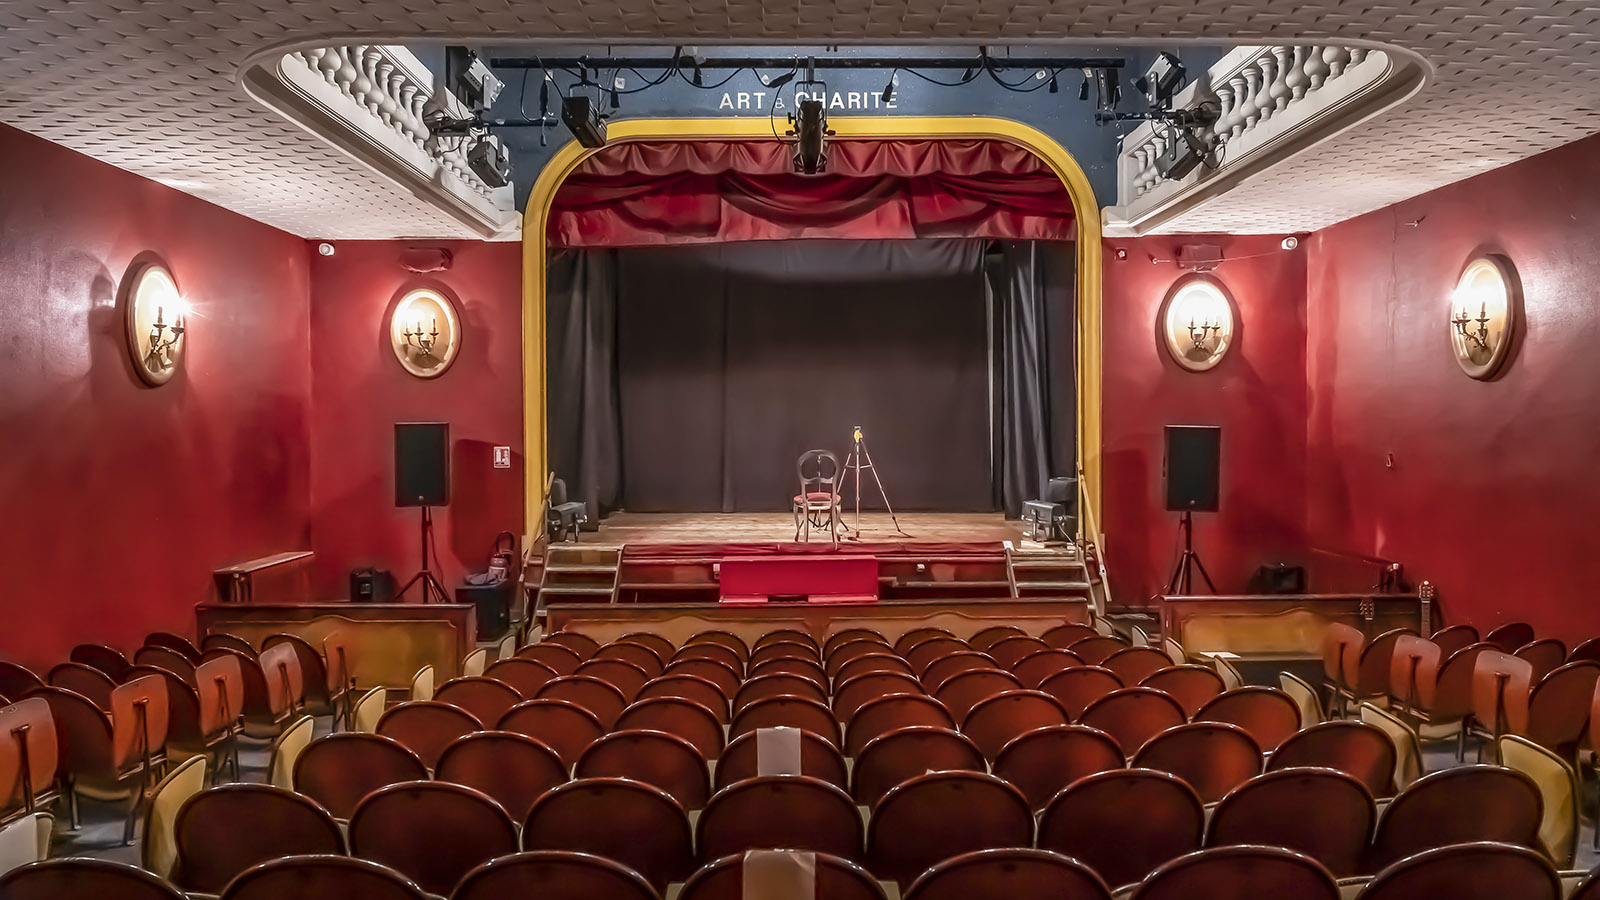 Der Bühnenraum des Théâtre de L'Œuvre. Foto: Hilke Maunder